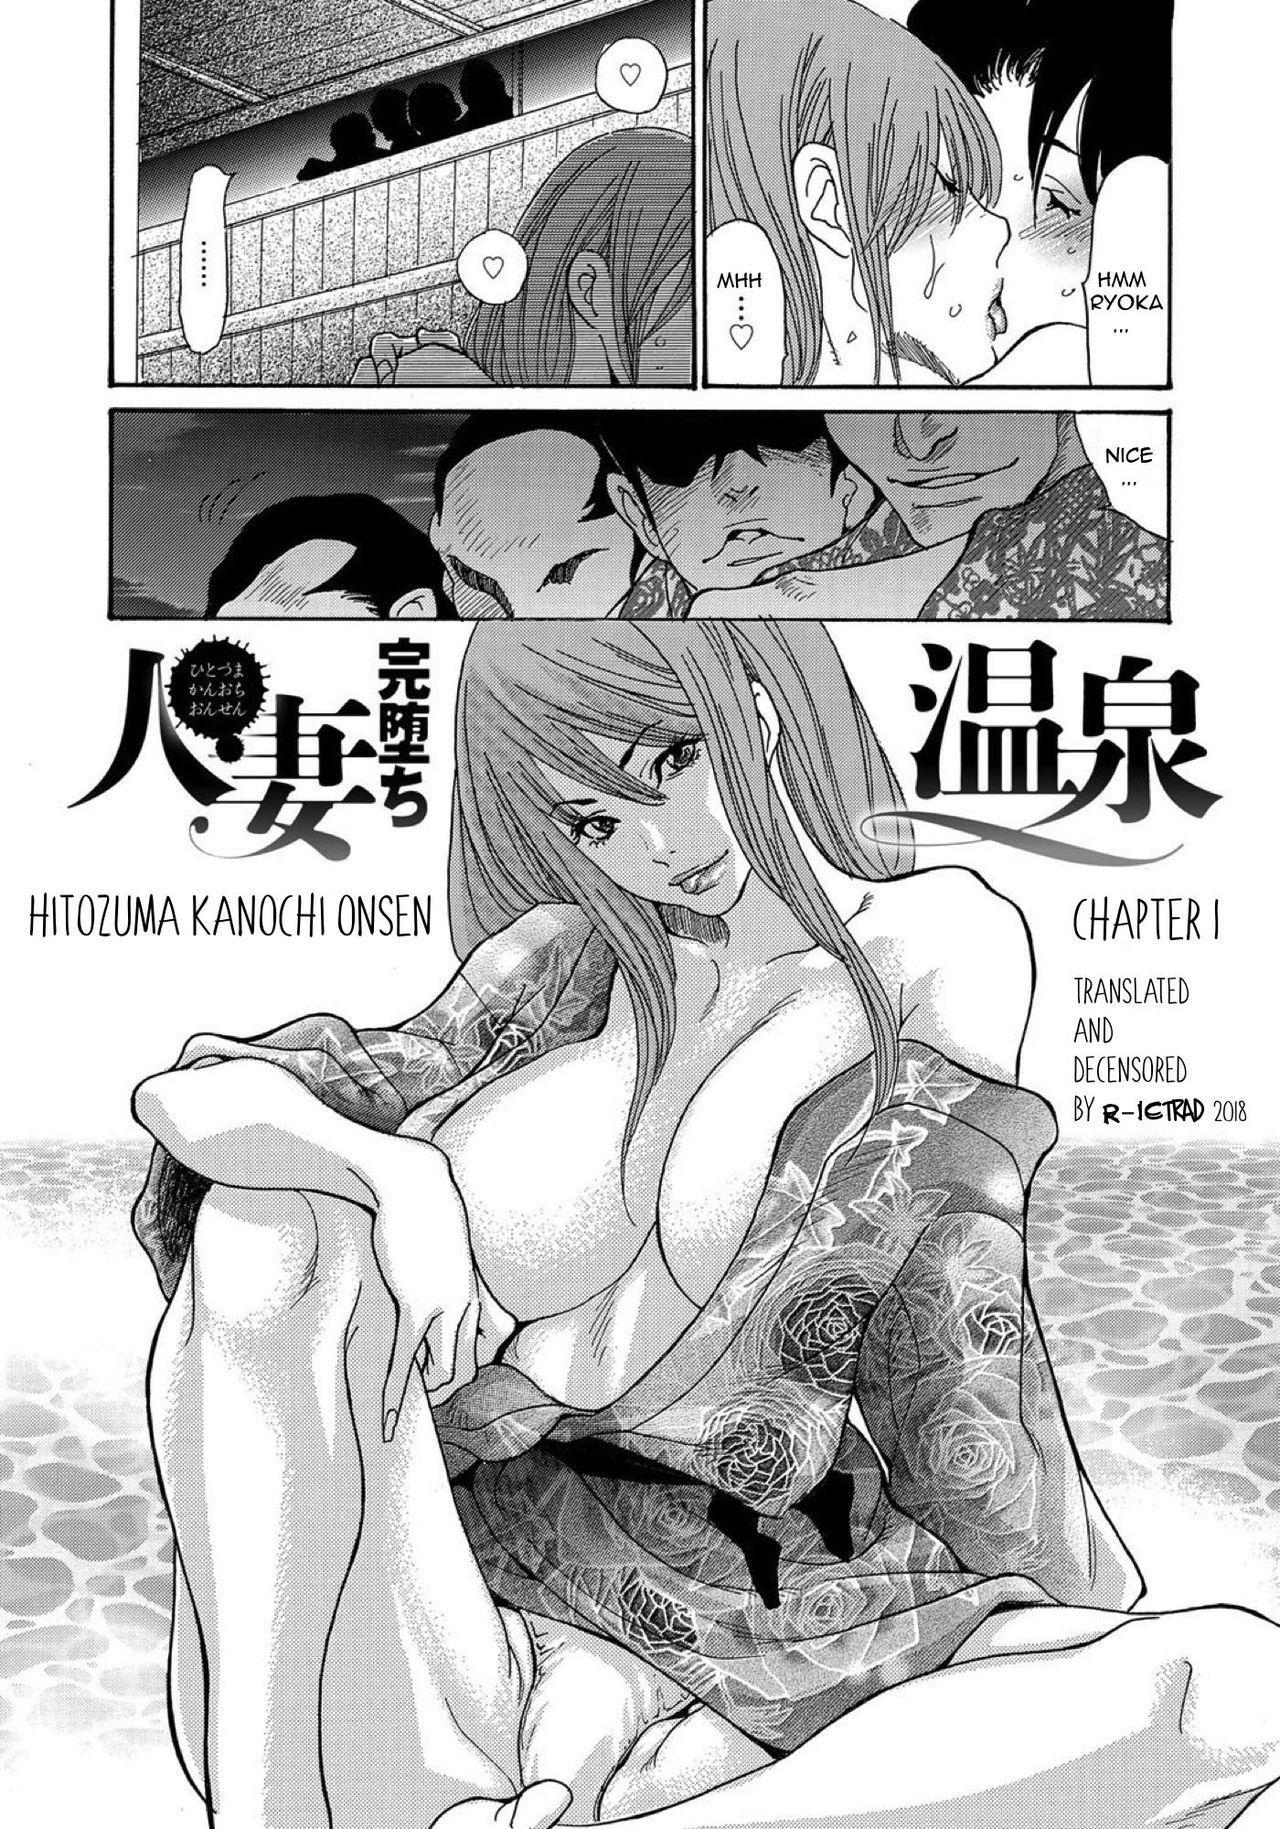 [Aoi Hitori] Yankee Zuma Kanraku!-Extended-Chapter 1-ONGOING[decensored][English][R-IC]ONGOING 6